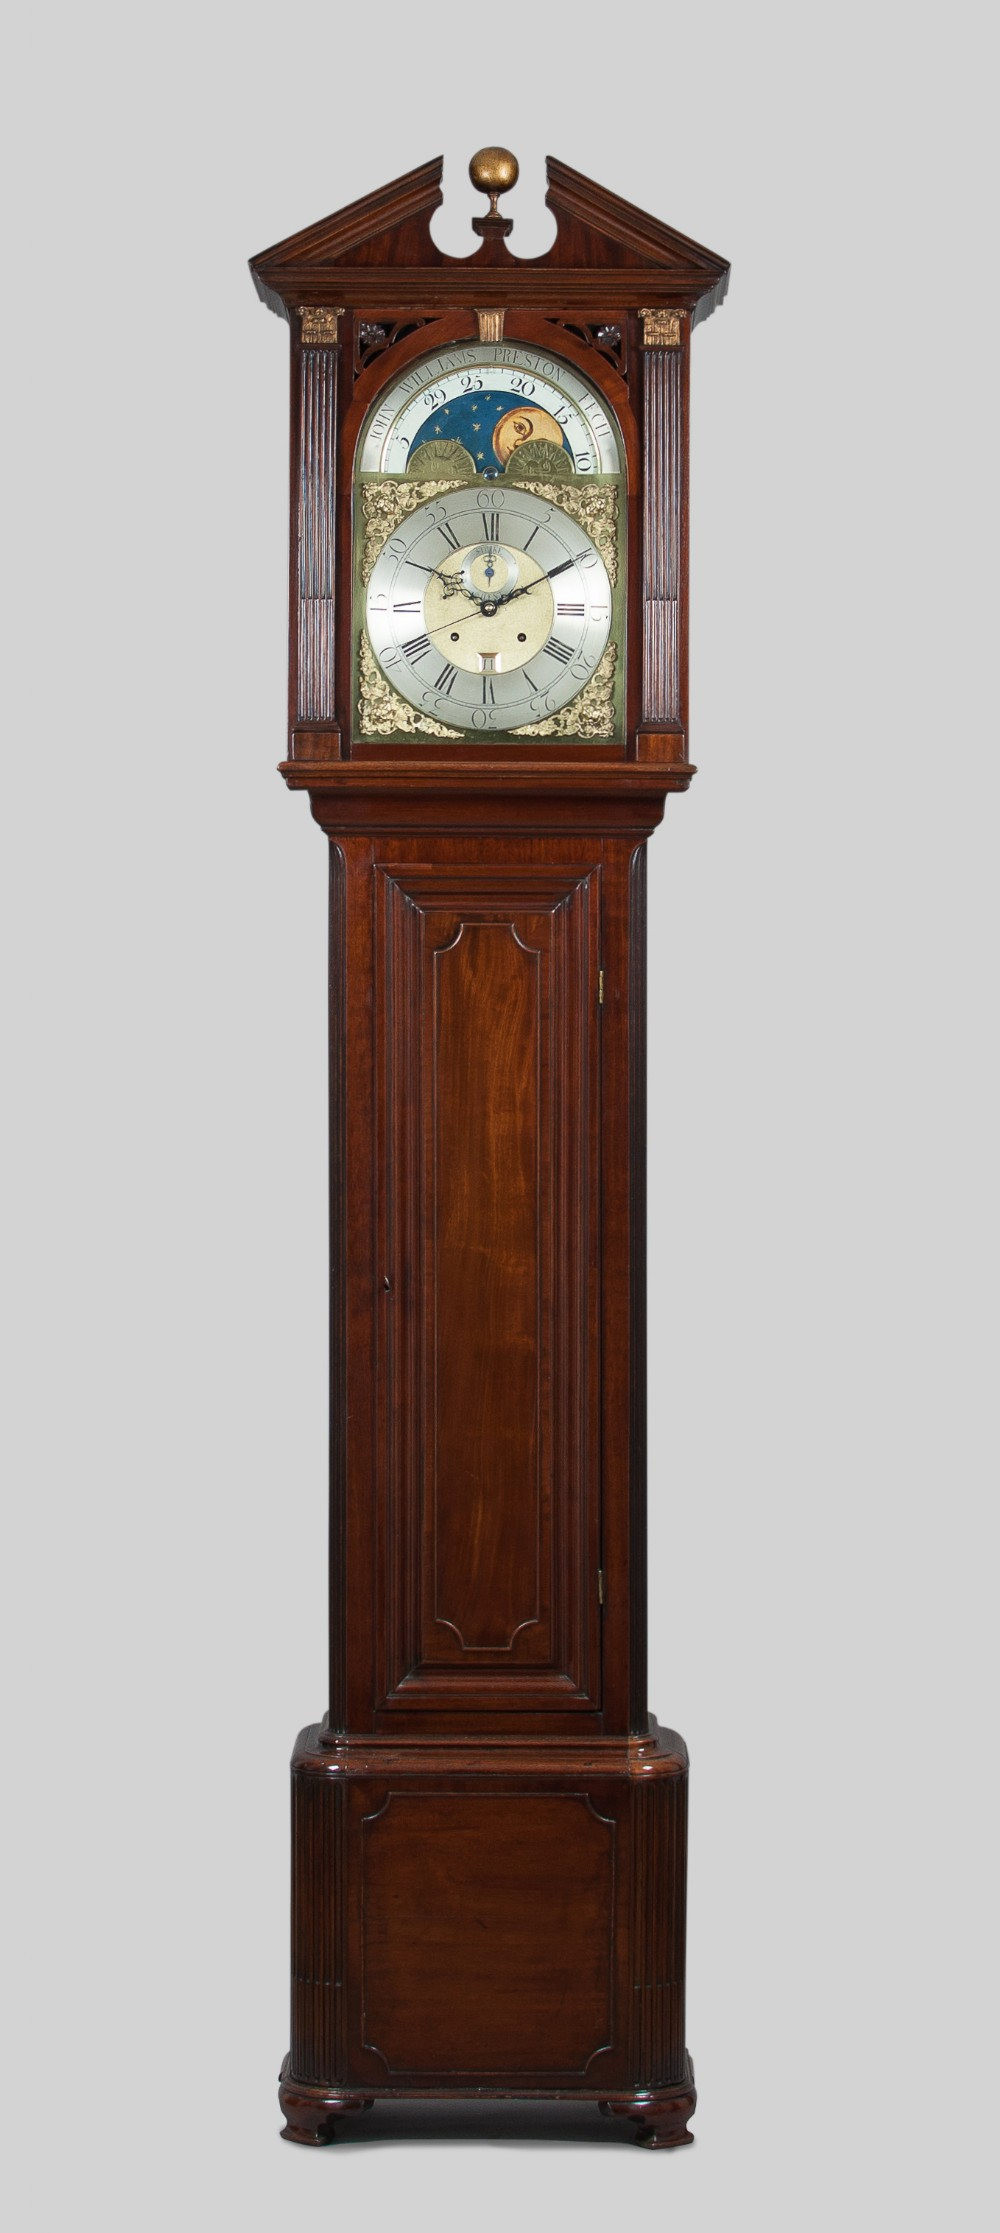 georgian mahogany longcase grandfather clock by williams of preston